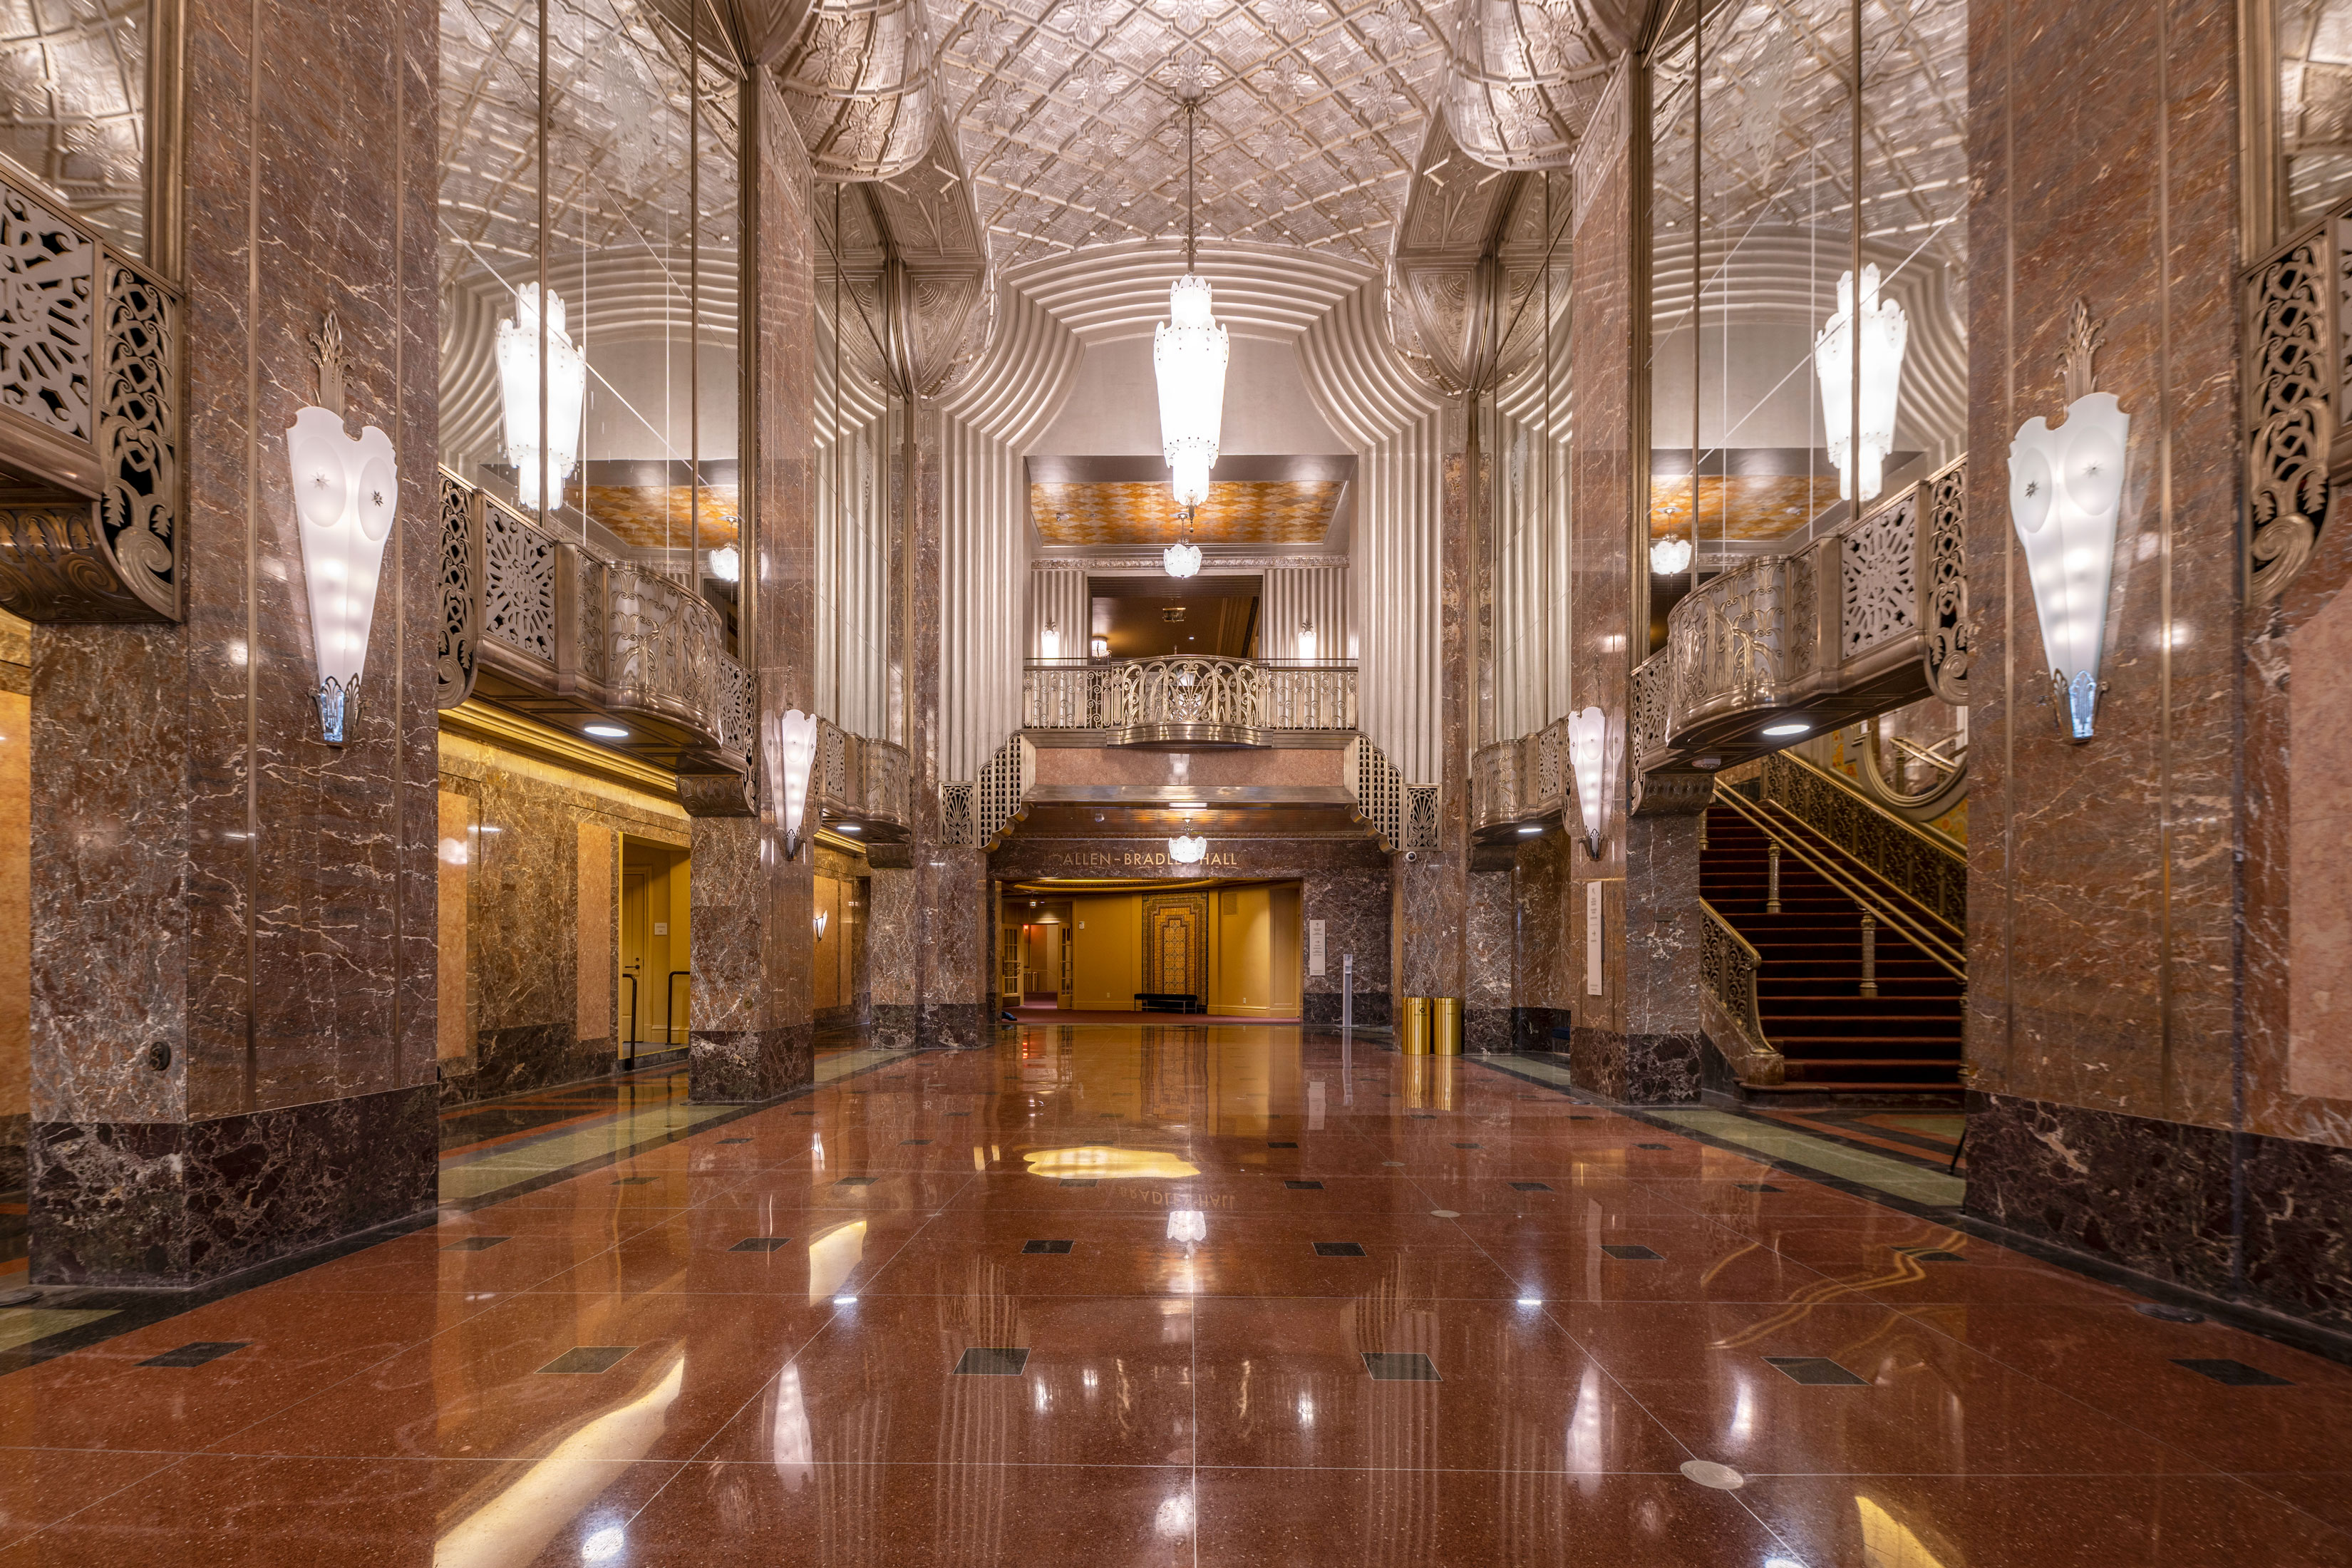 Bradley Symphony Center historic grand lobby of Milwaukee Symphony Orchestra